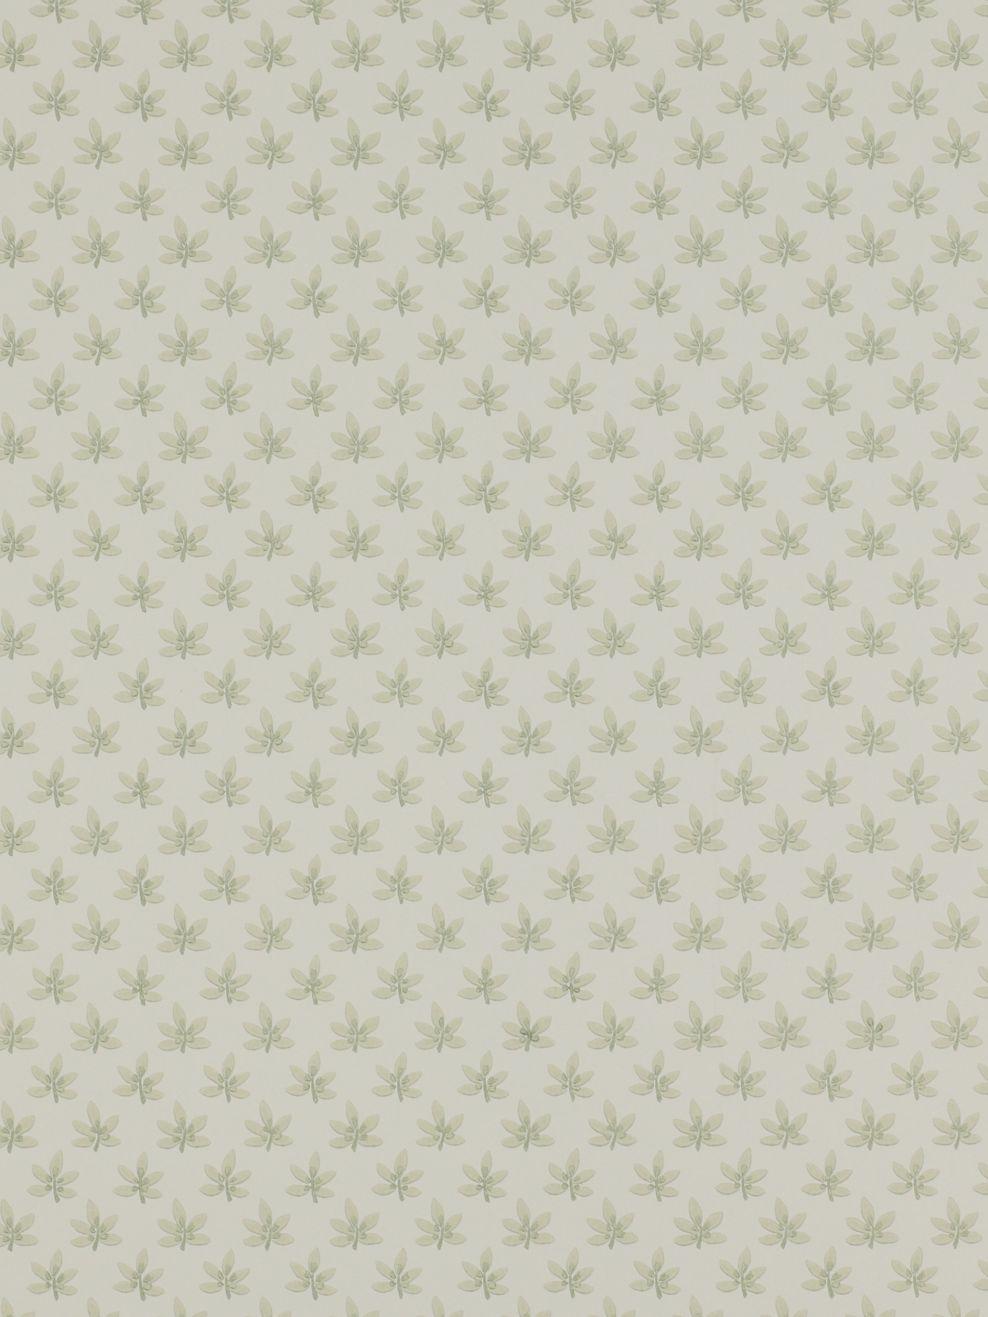 Colefax & Fowler Colefax & Fowler Maple Wallpaper